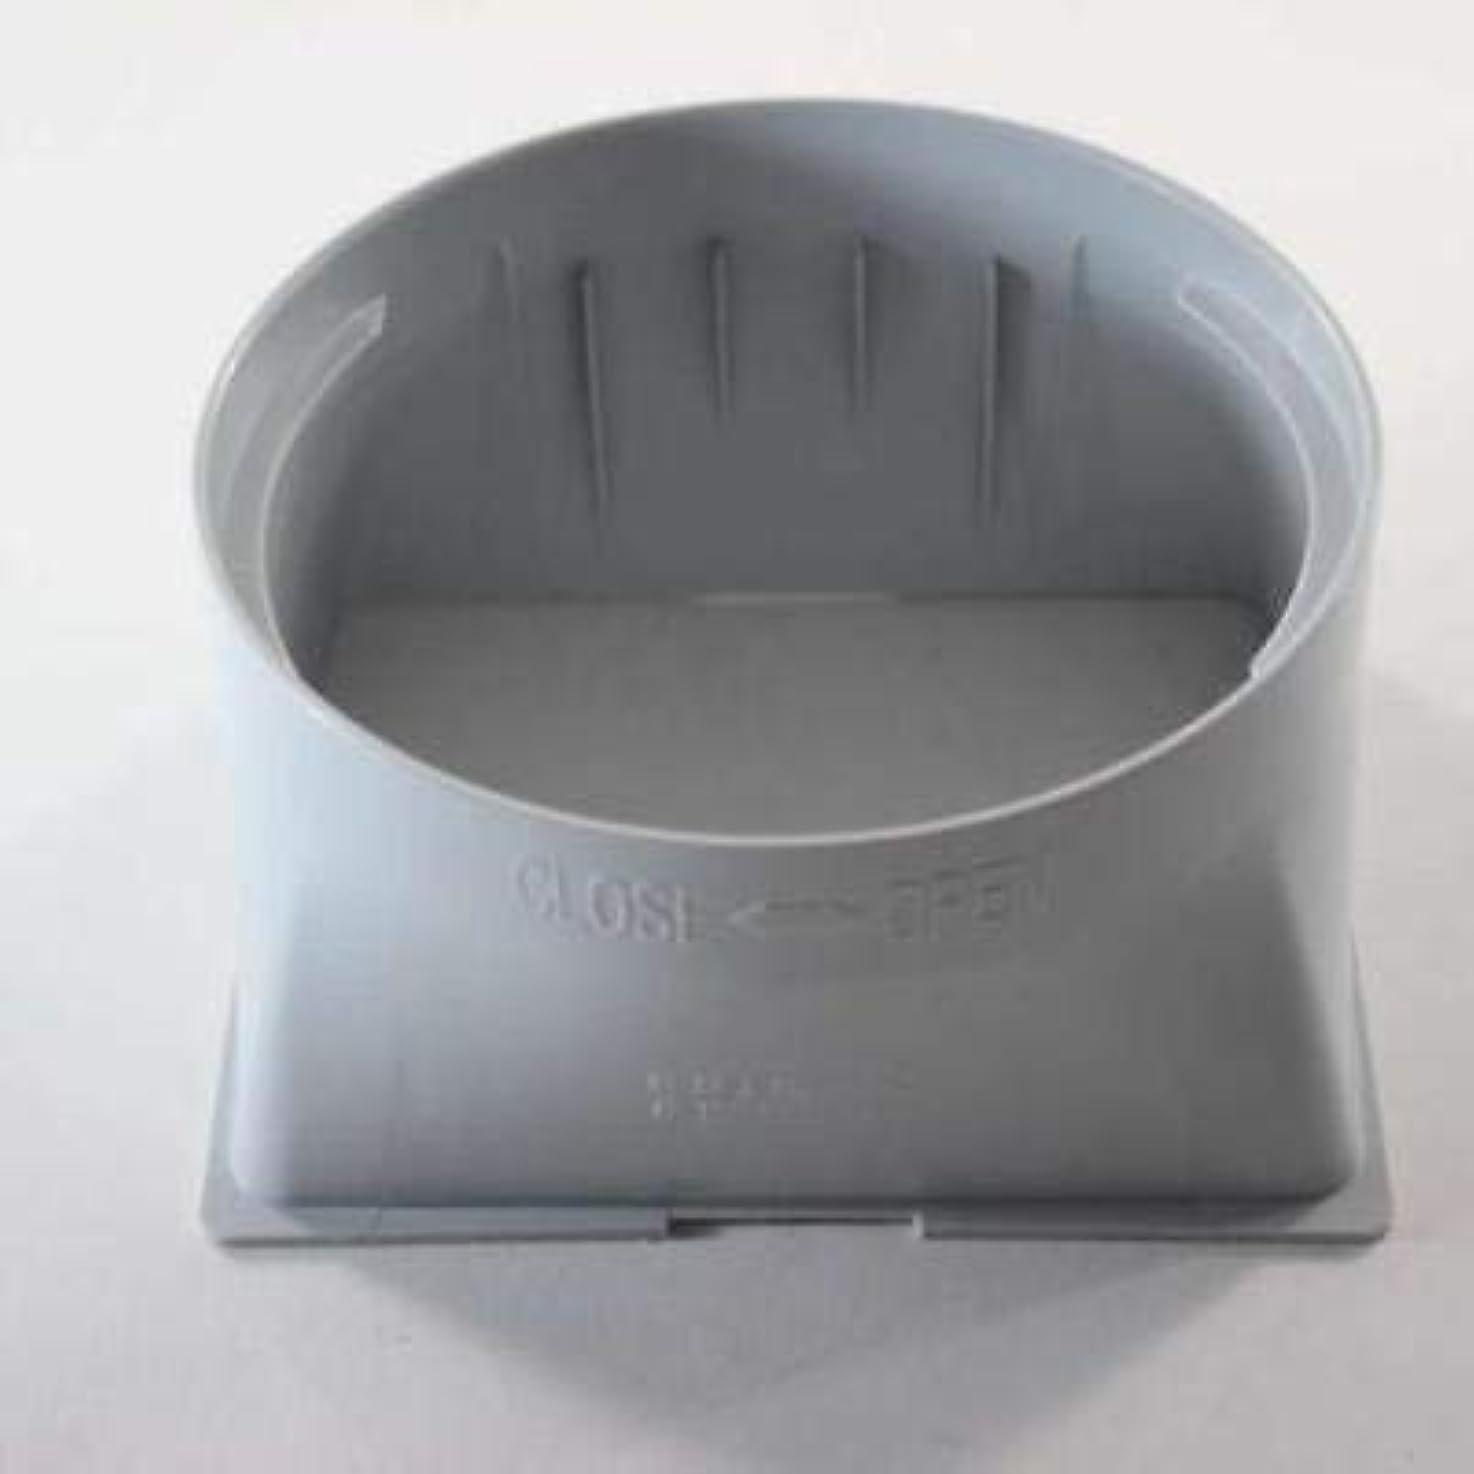 TKW Square to Round Portable A/C Adaptor Fits Hisense erfmmpwawnvgm7